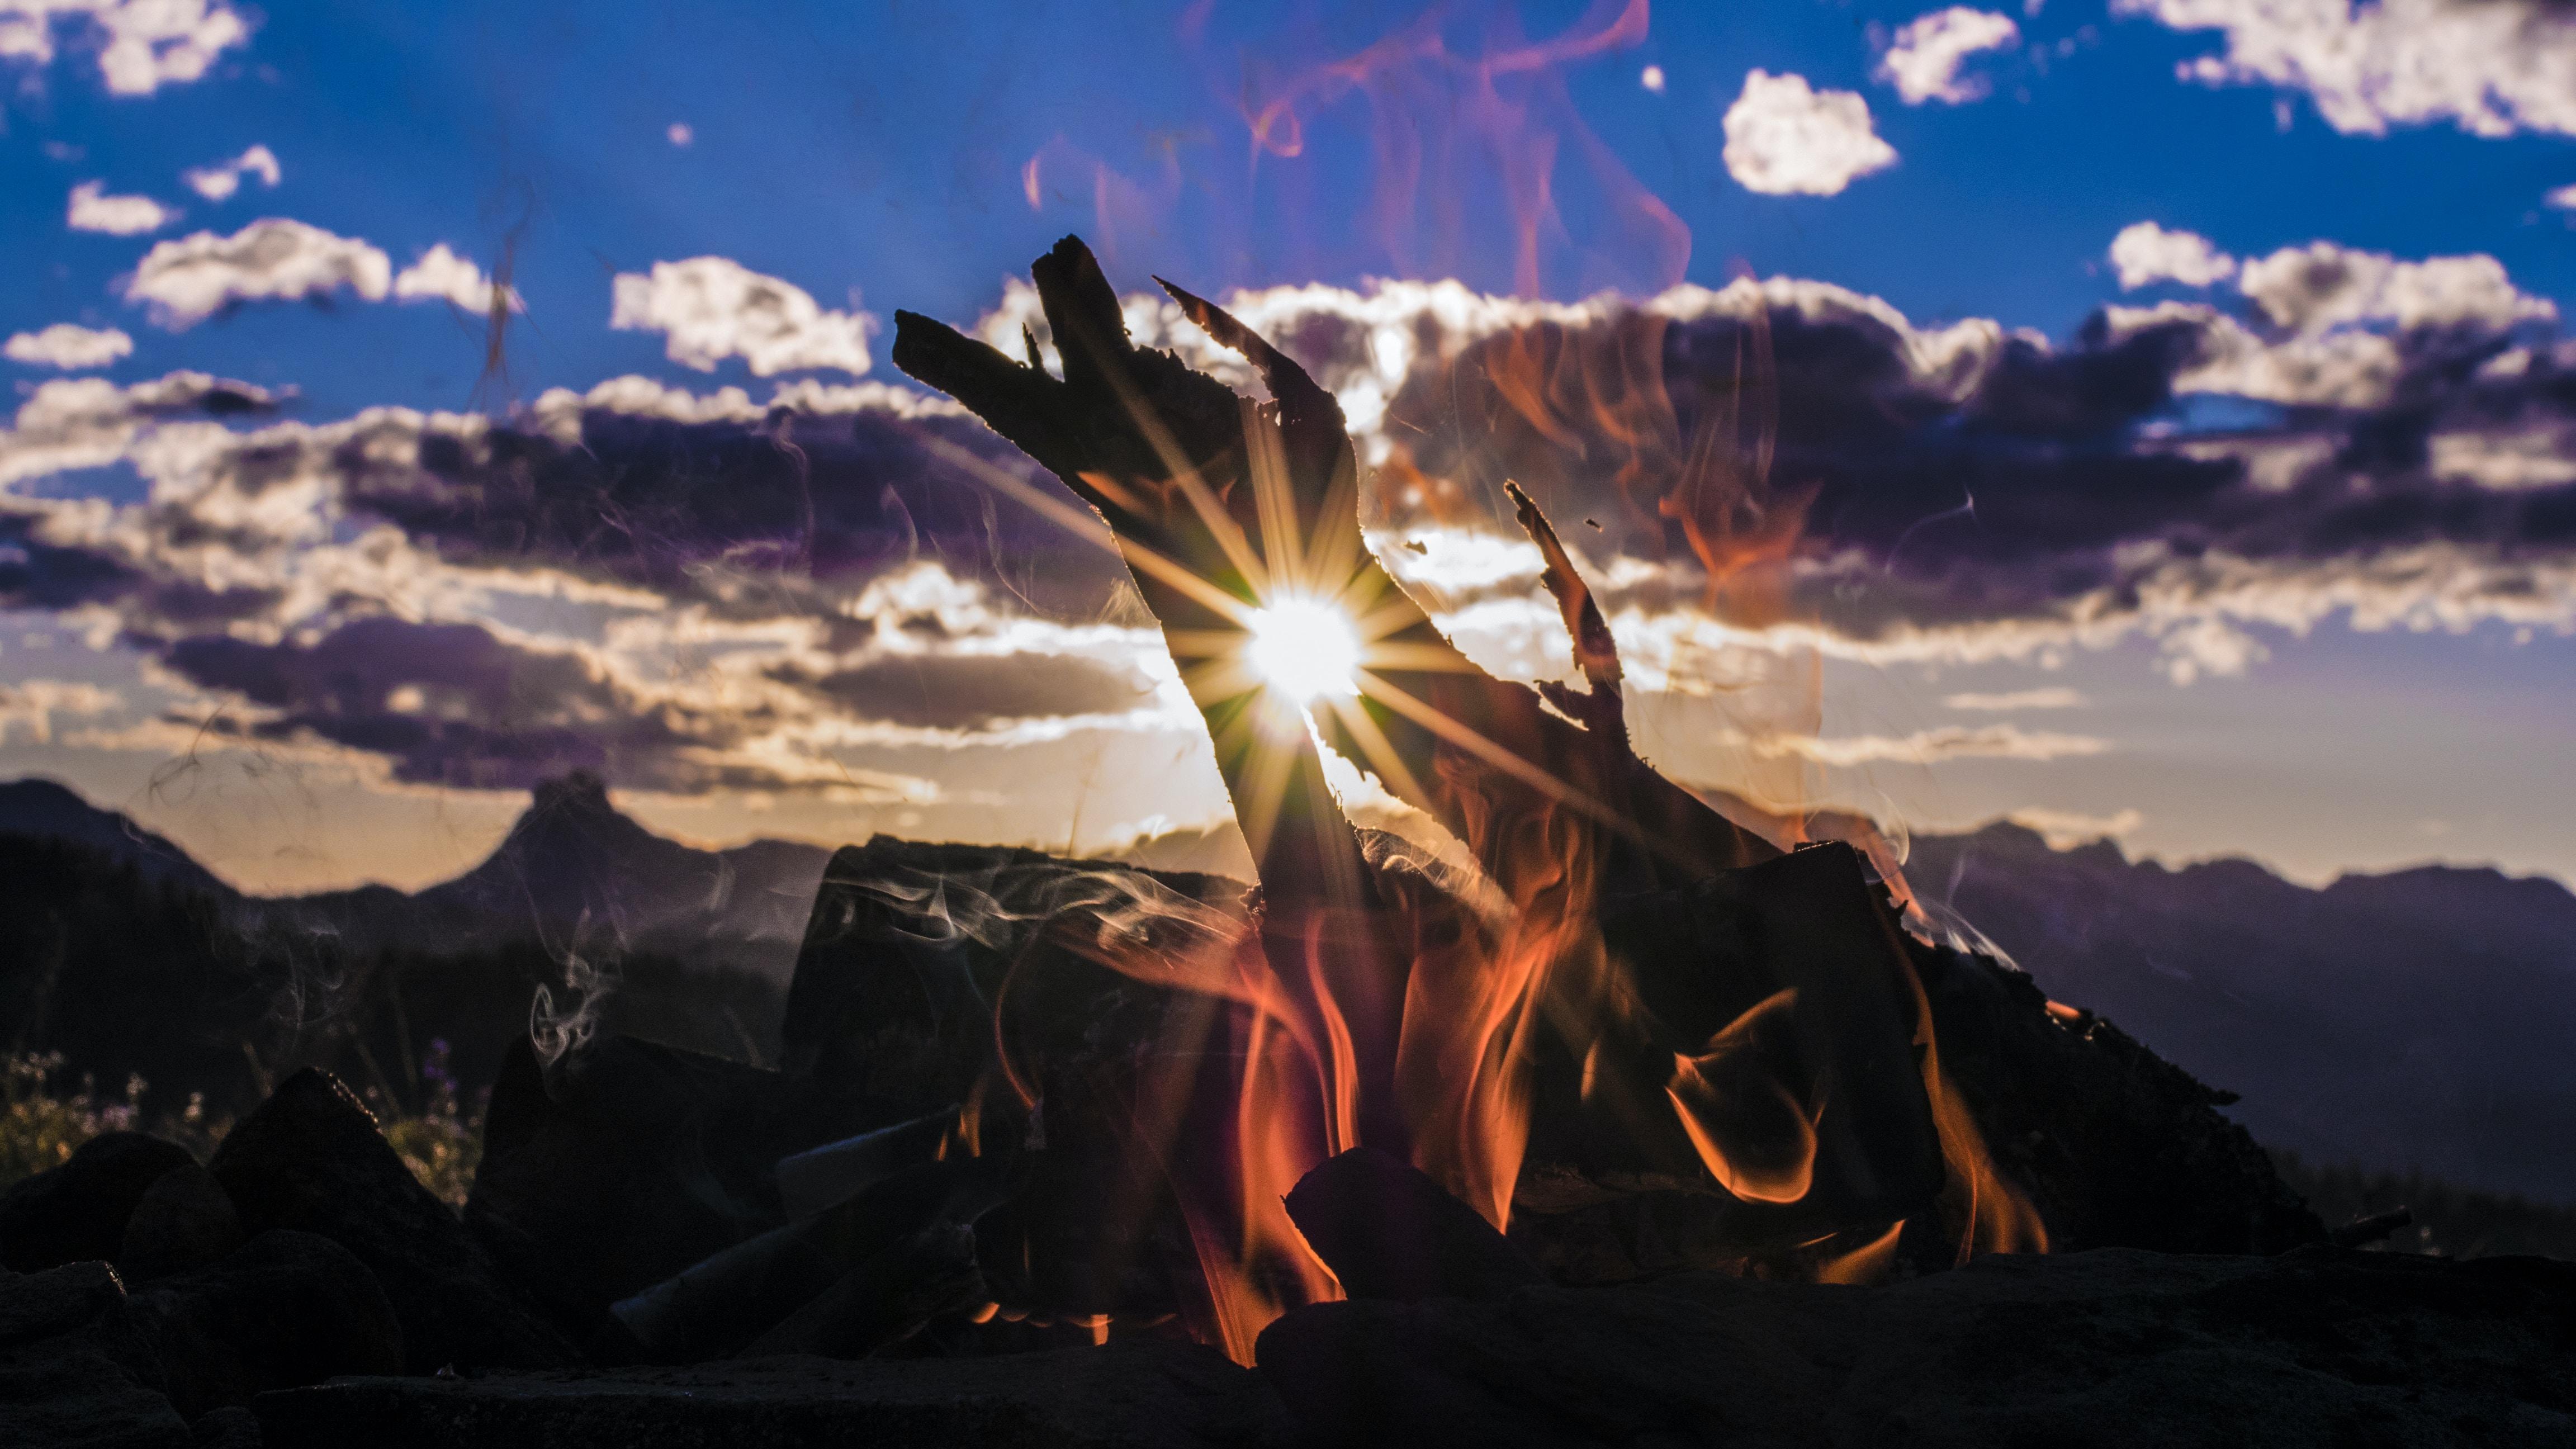 bone fire beside mountain with cloudy sky